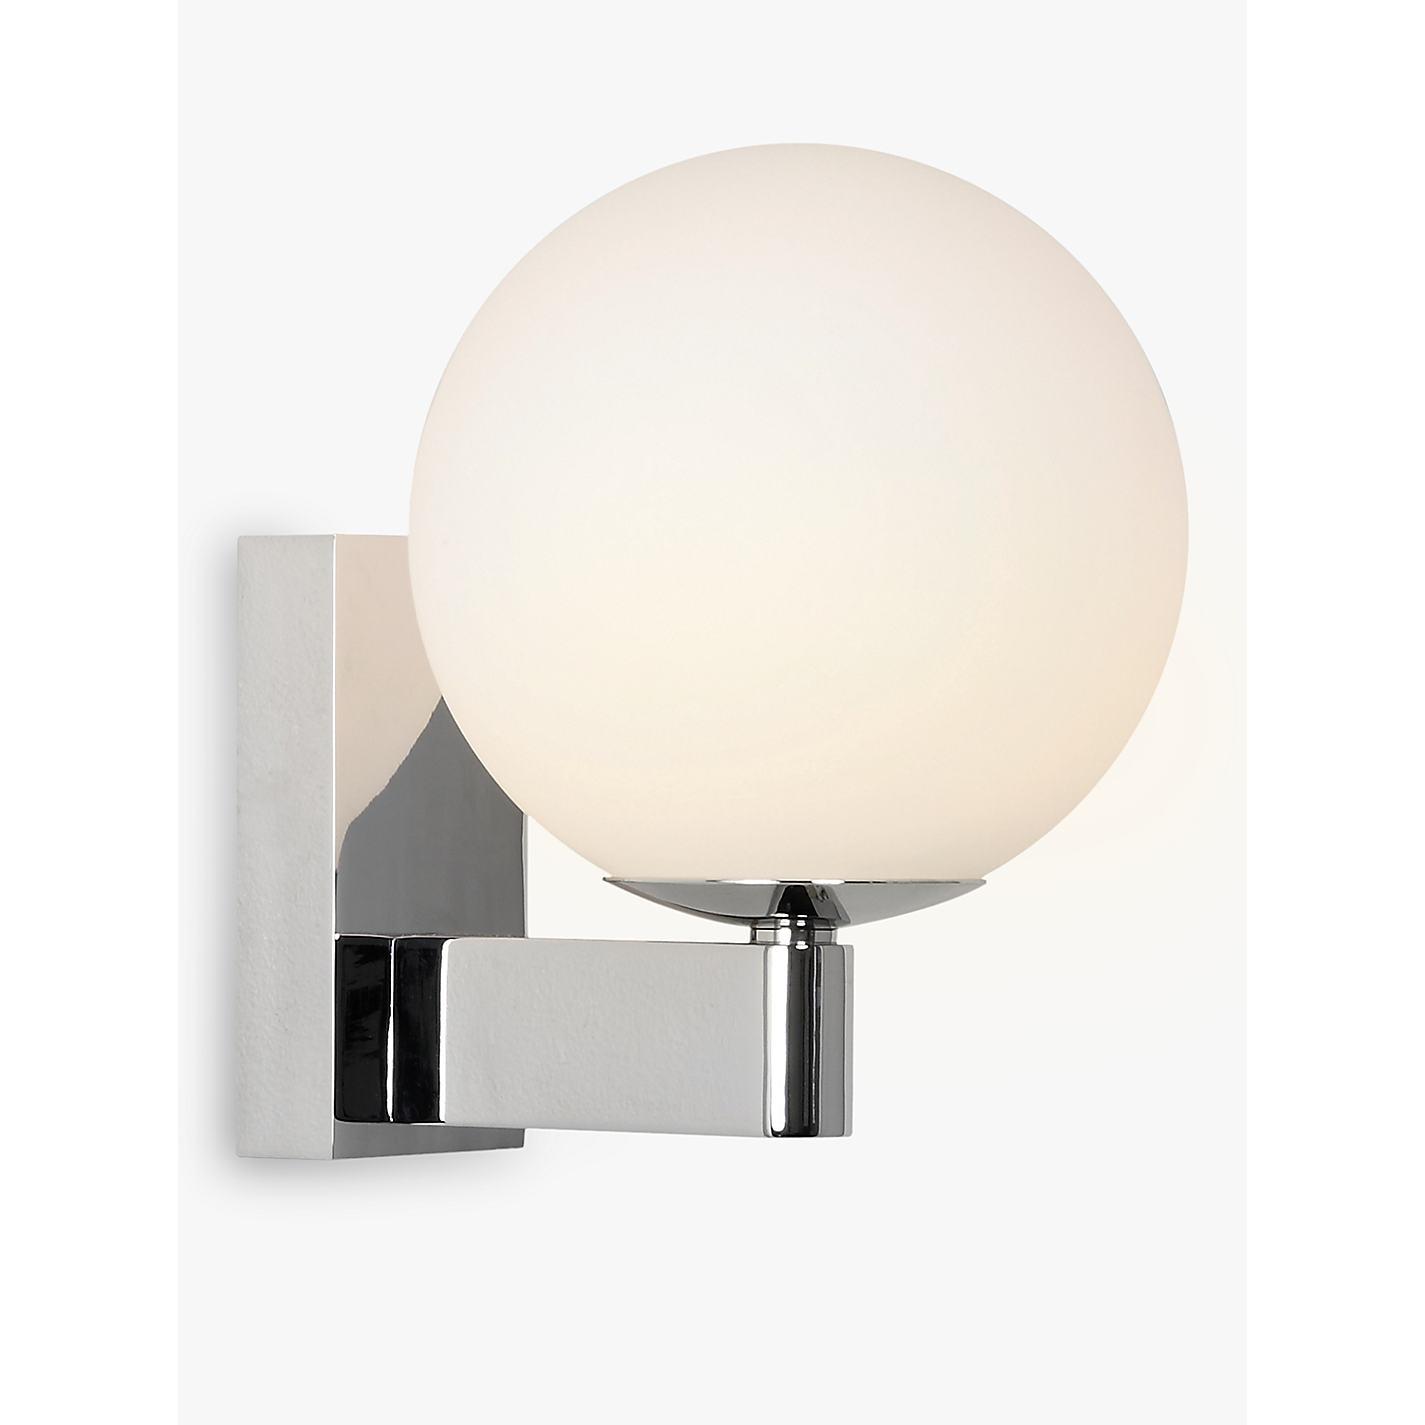 Buy astro sagara bathroom wall light john lewis buy astro sagara bathroom wall light online at johnlewis mozeypictures Image collections